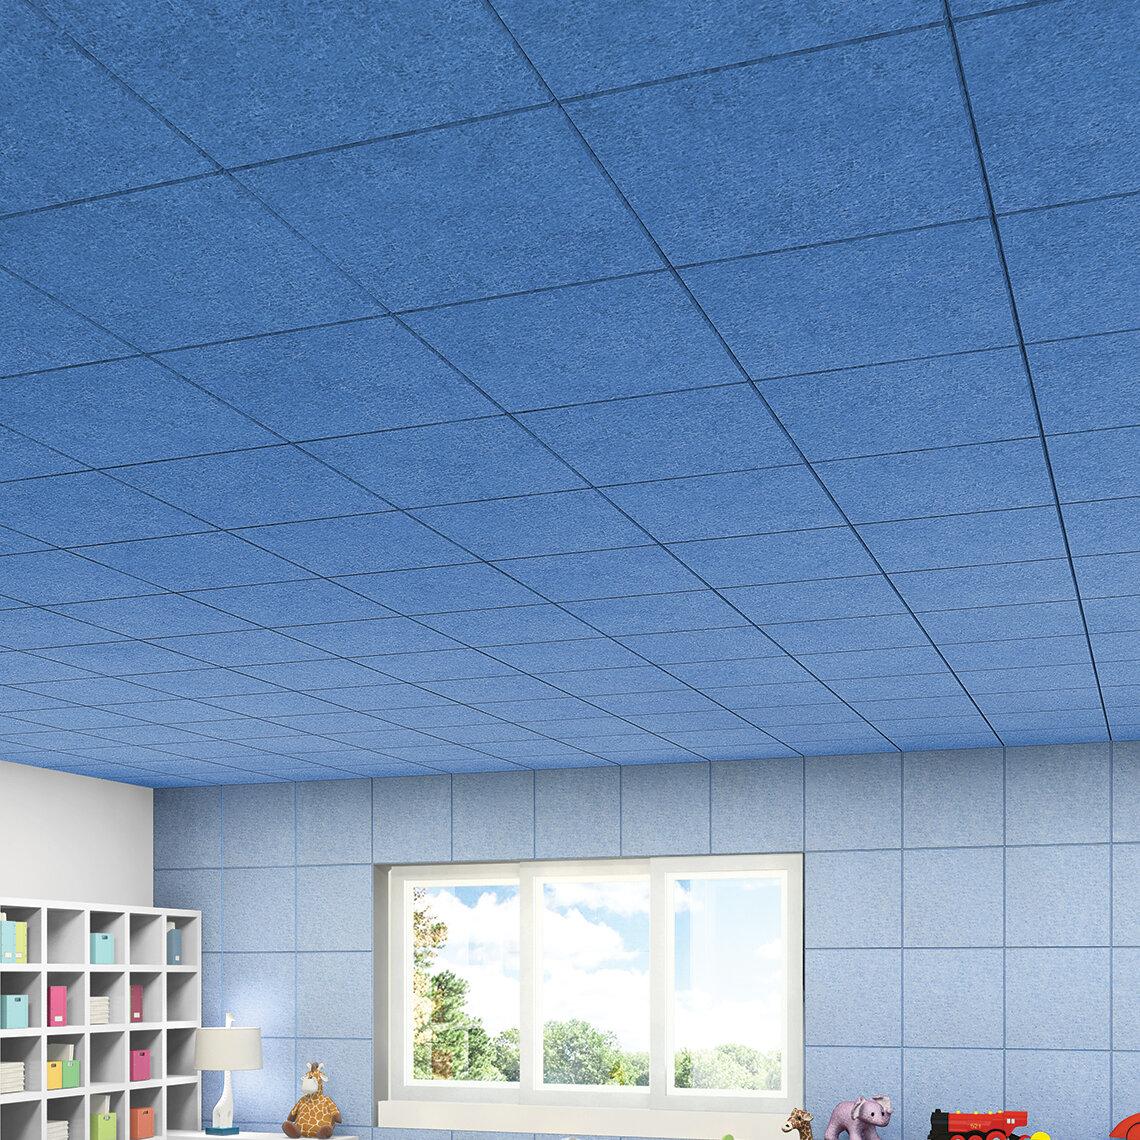 Toptile 2 ft. x 2 ft. Lay-In Ceiling Tile in Sky Blue | Wayfair